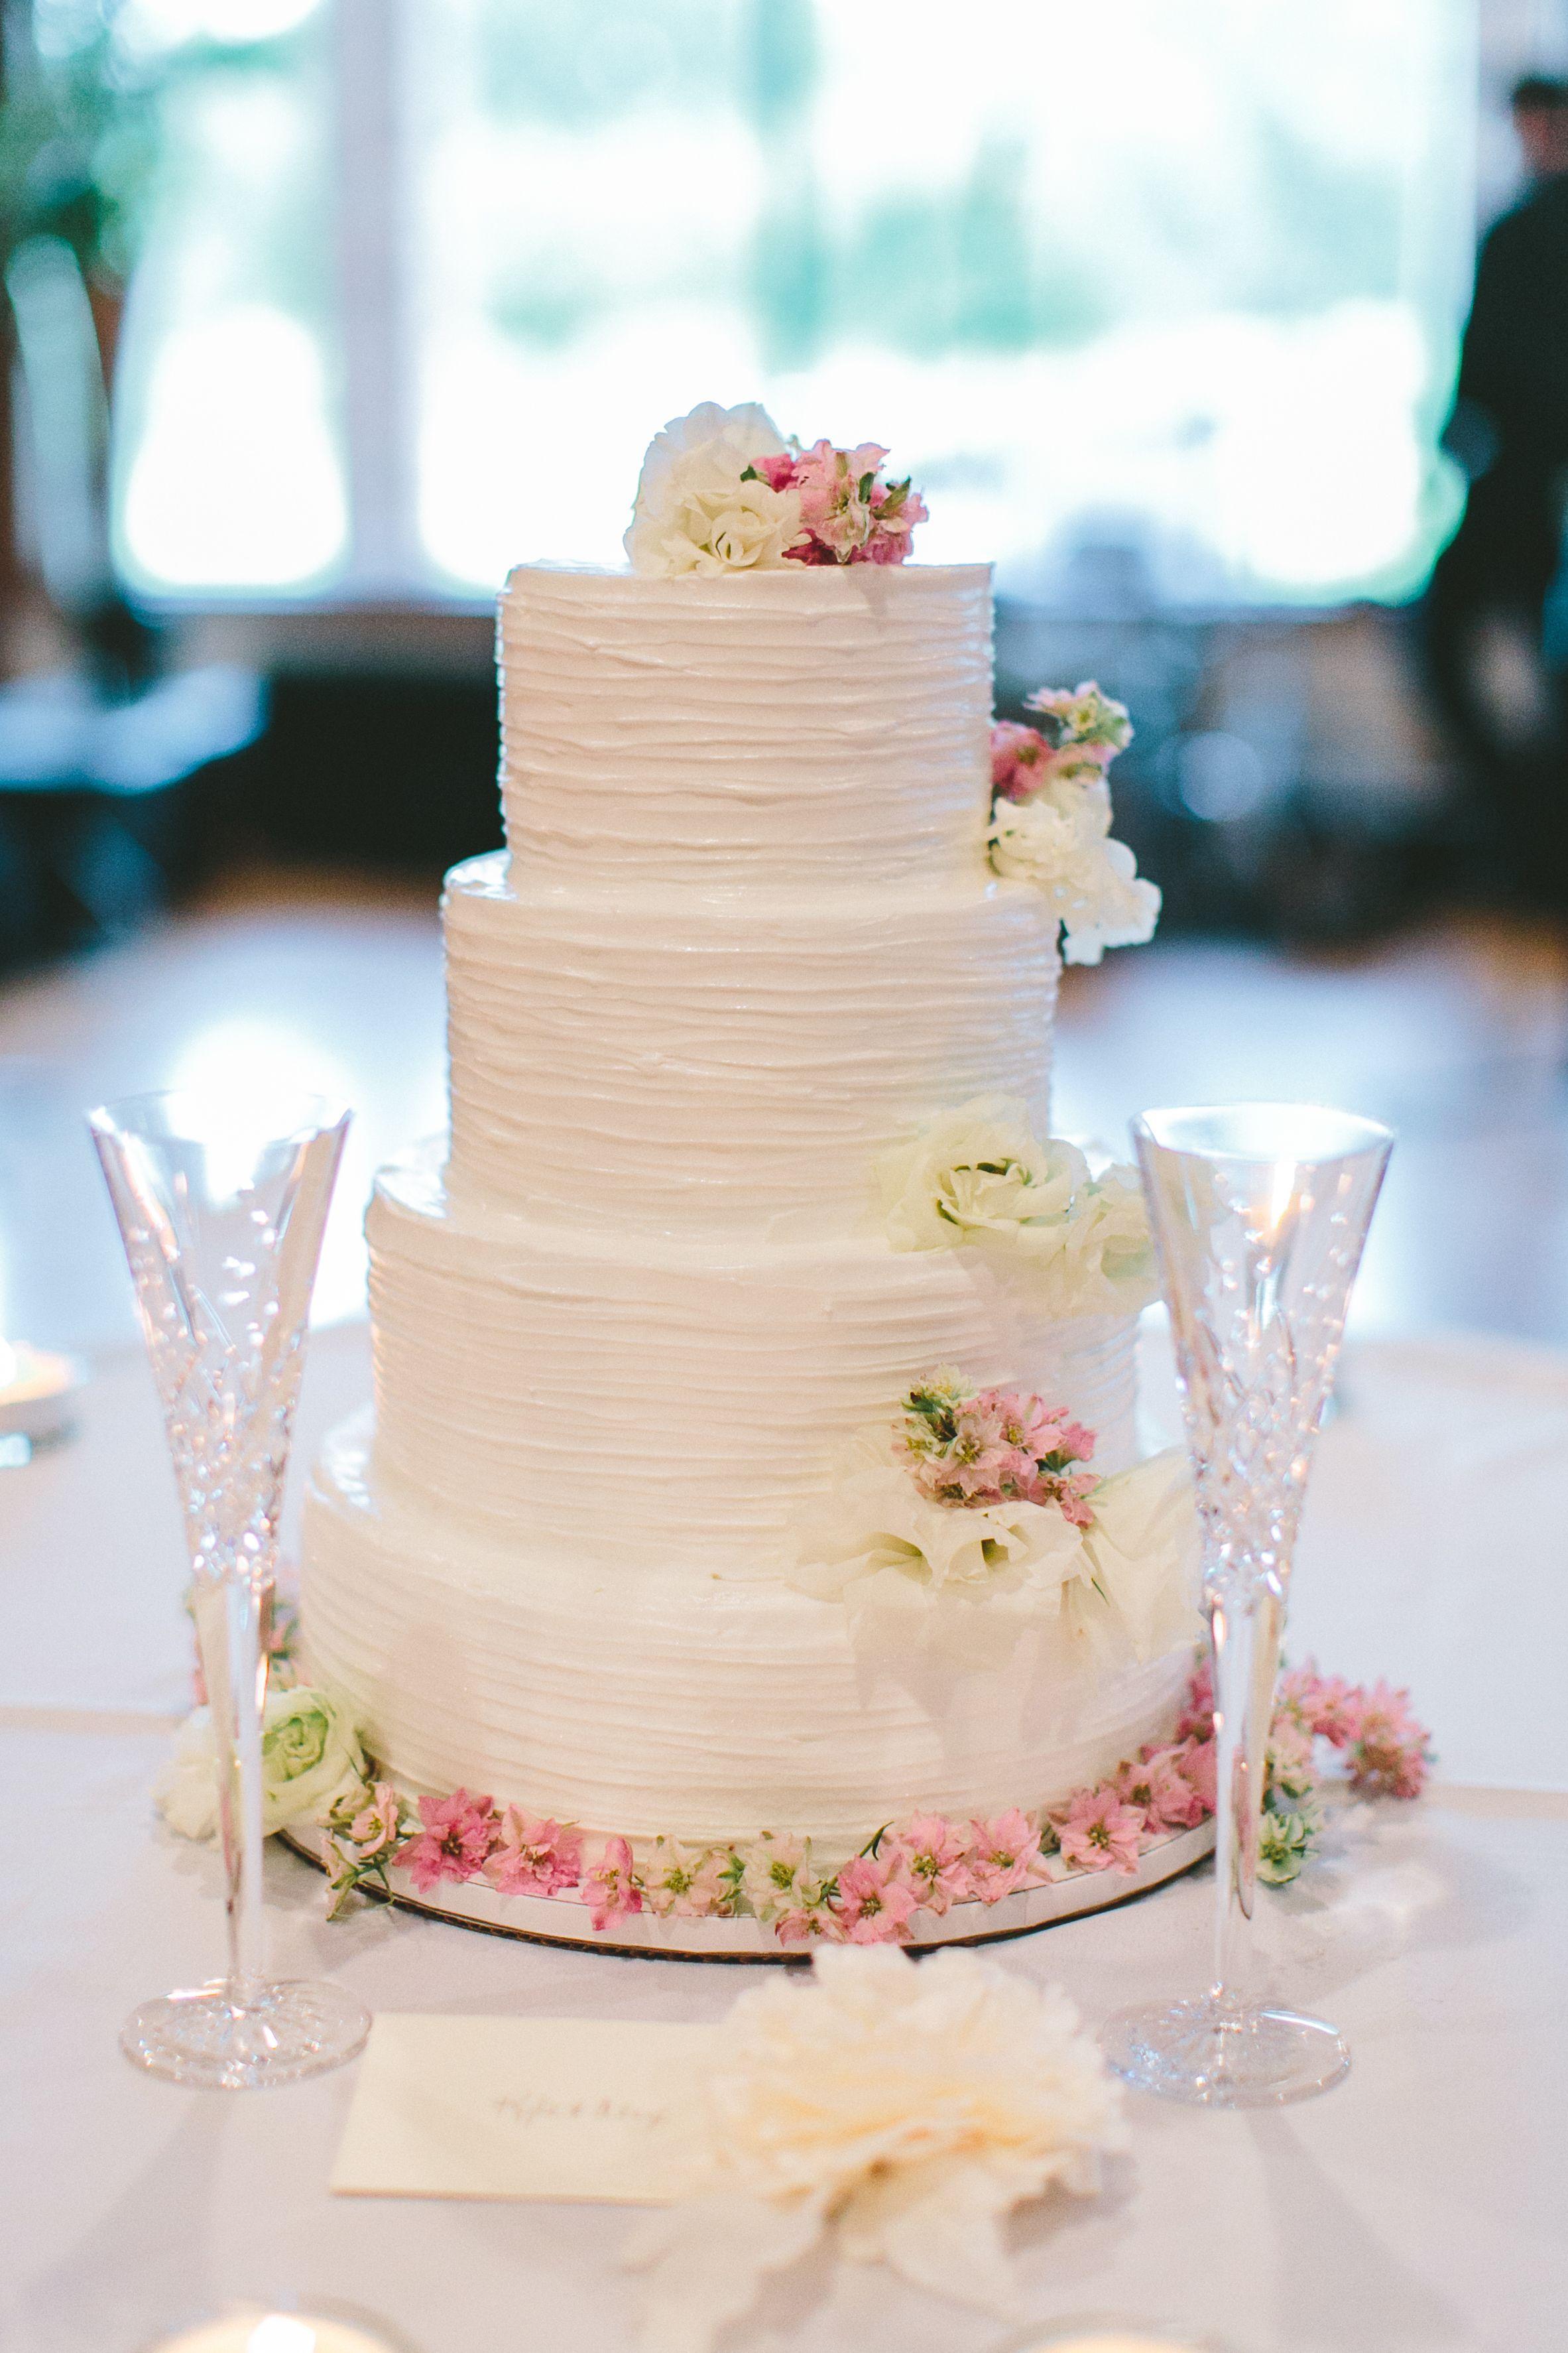 4 Tier Buttercream Wedding Cake, Epping, Essex - Gaynes